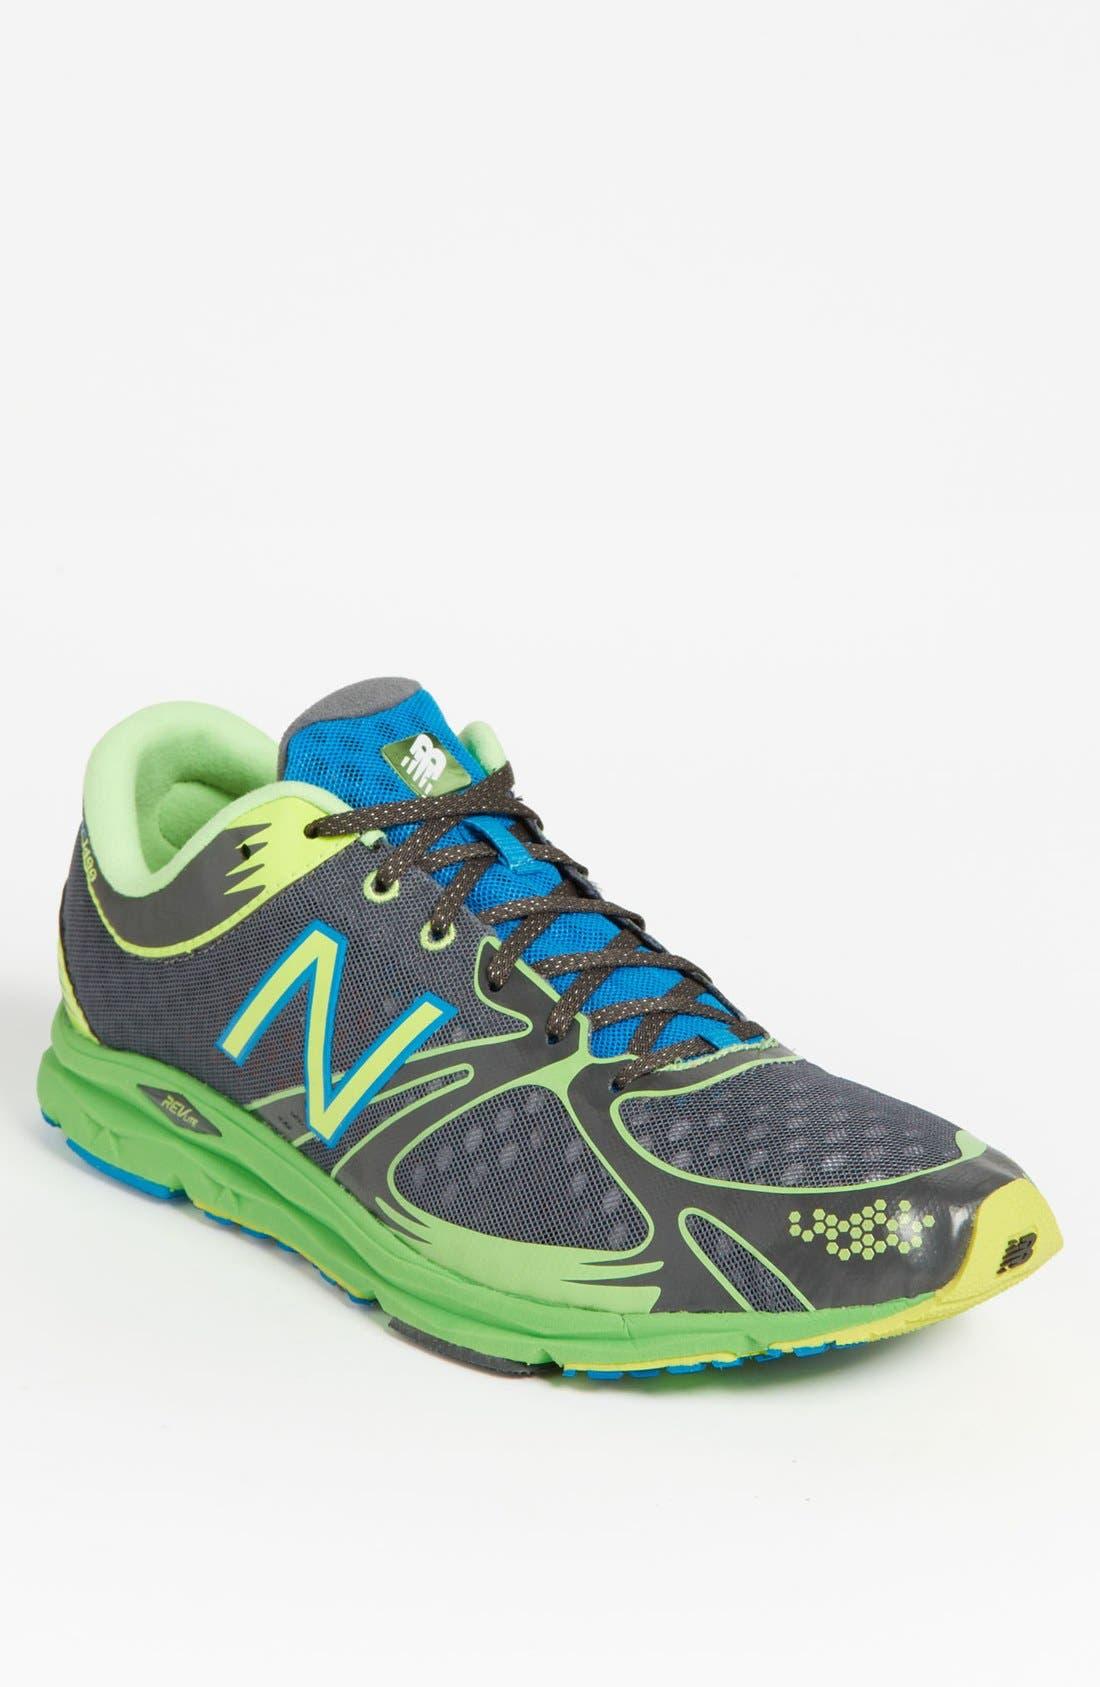 Alternate Image 1 Selected - New Balance '1400' Running Shoe (Men) (Online Only)